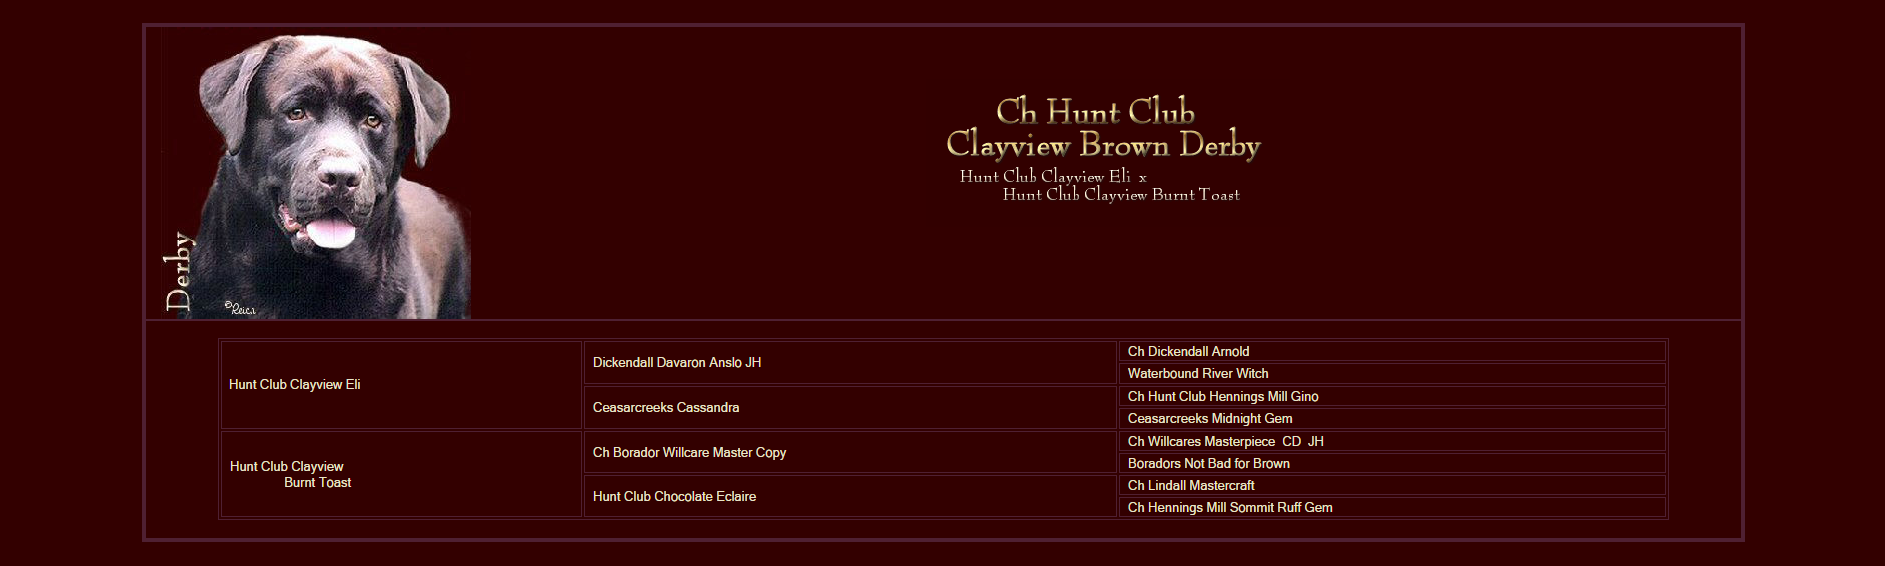 huntclublabsDerby